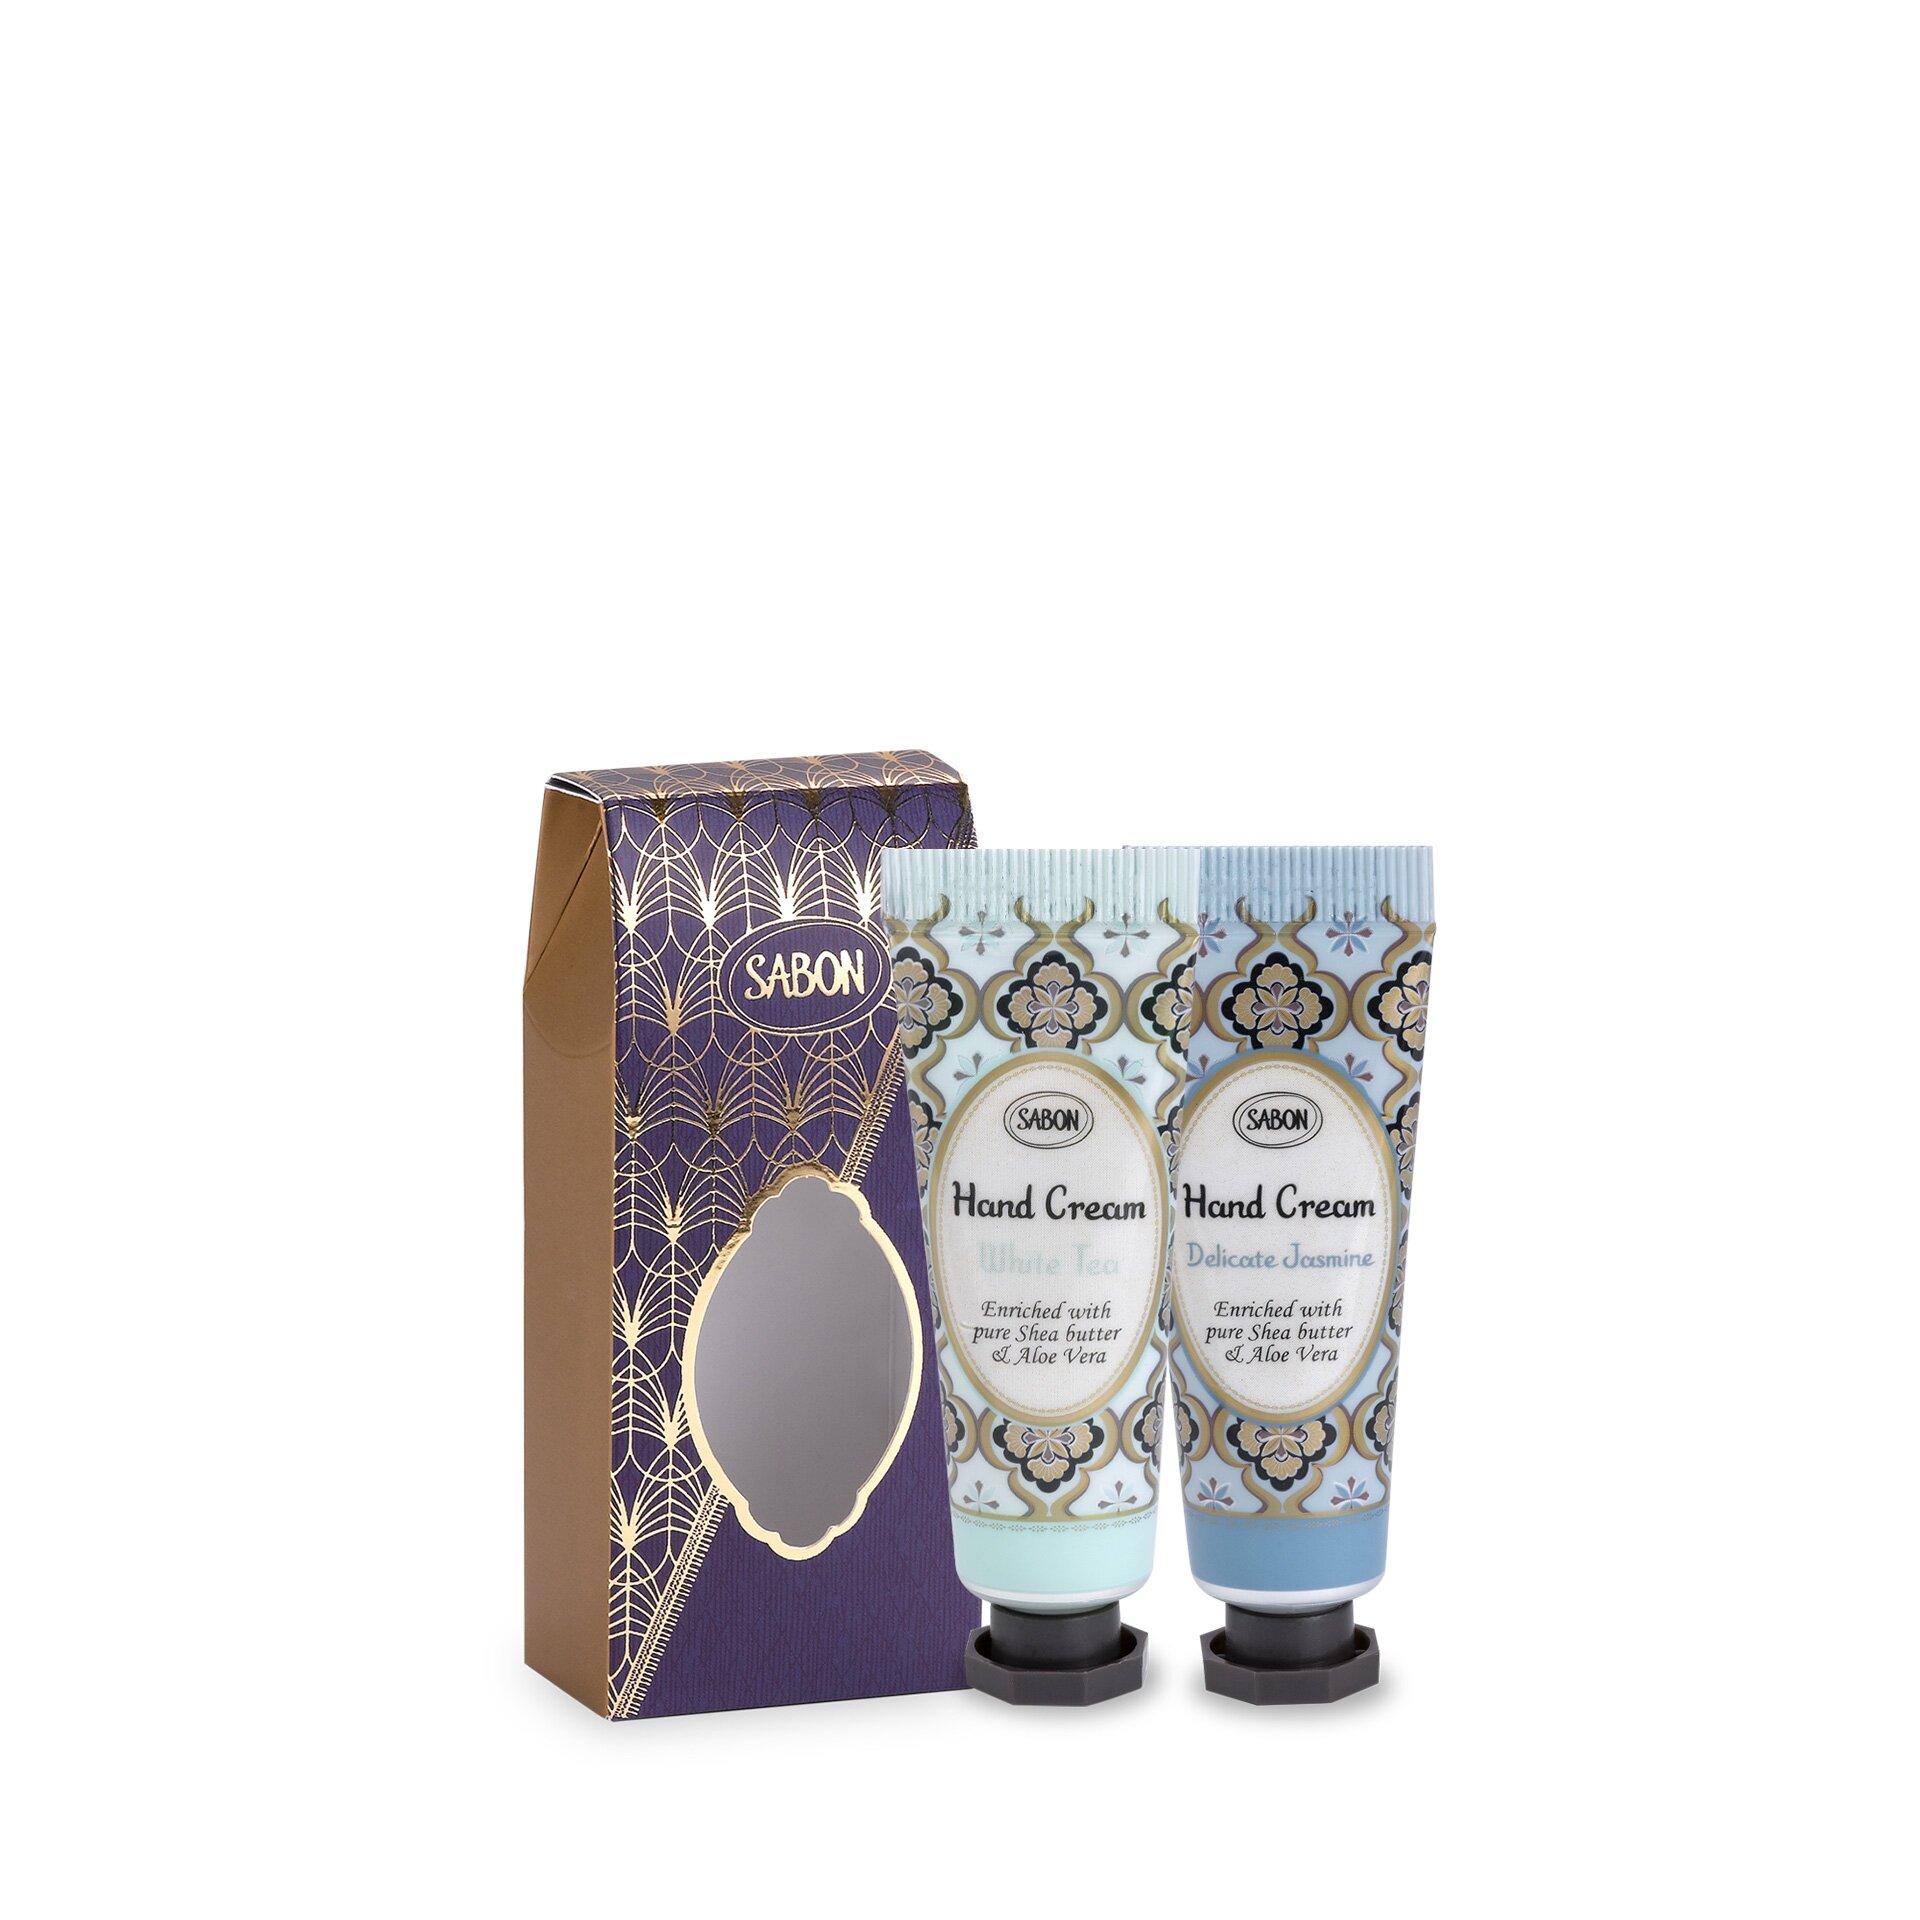 Gift Set Access - Hand Cream - 4